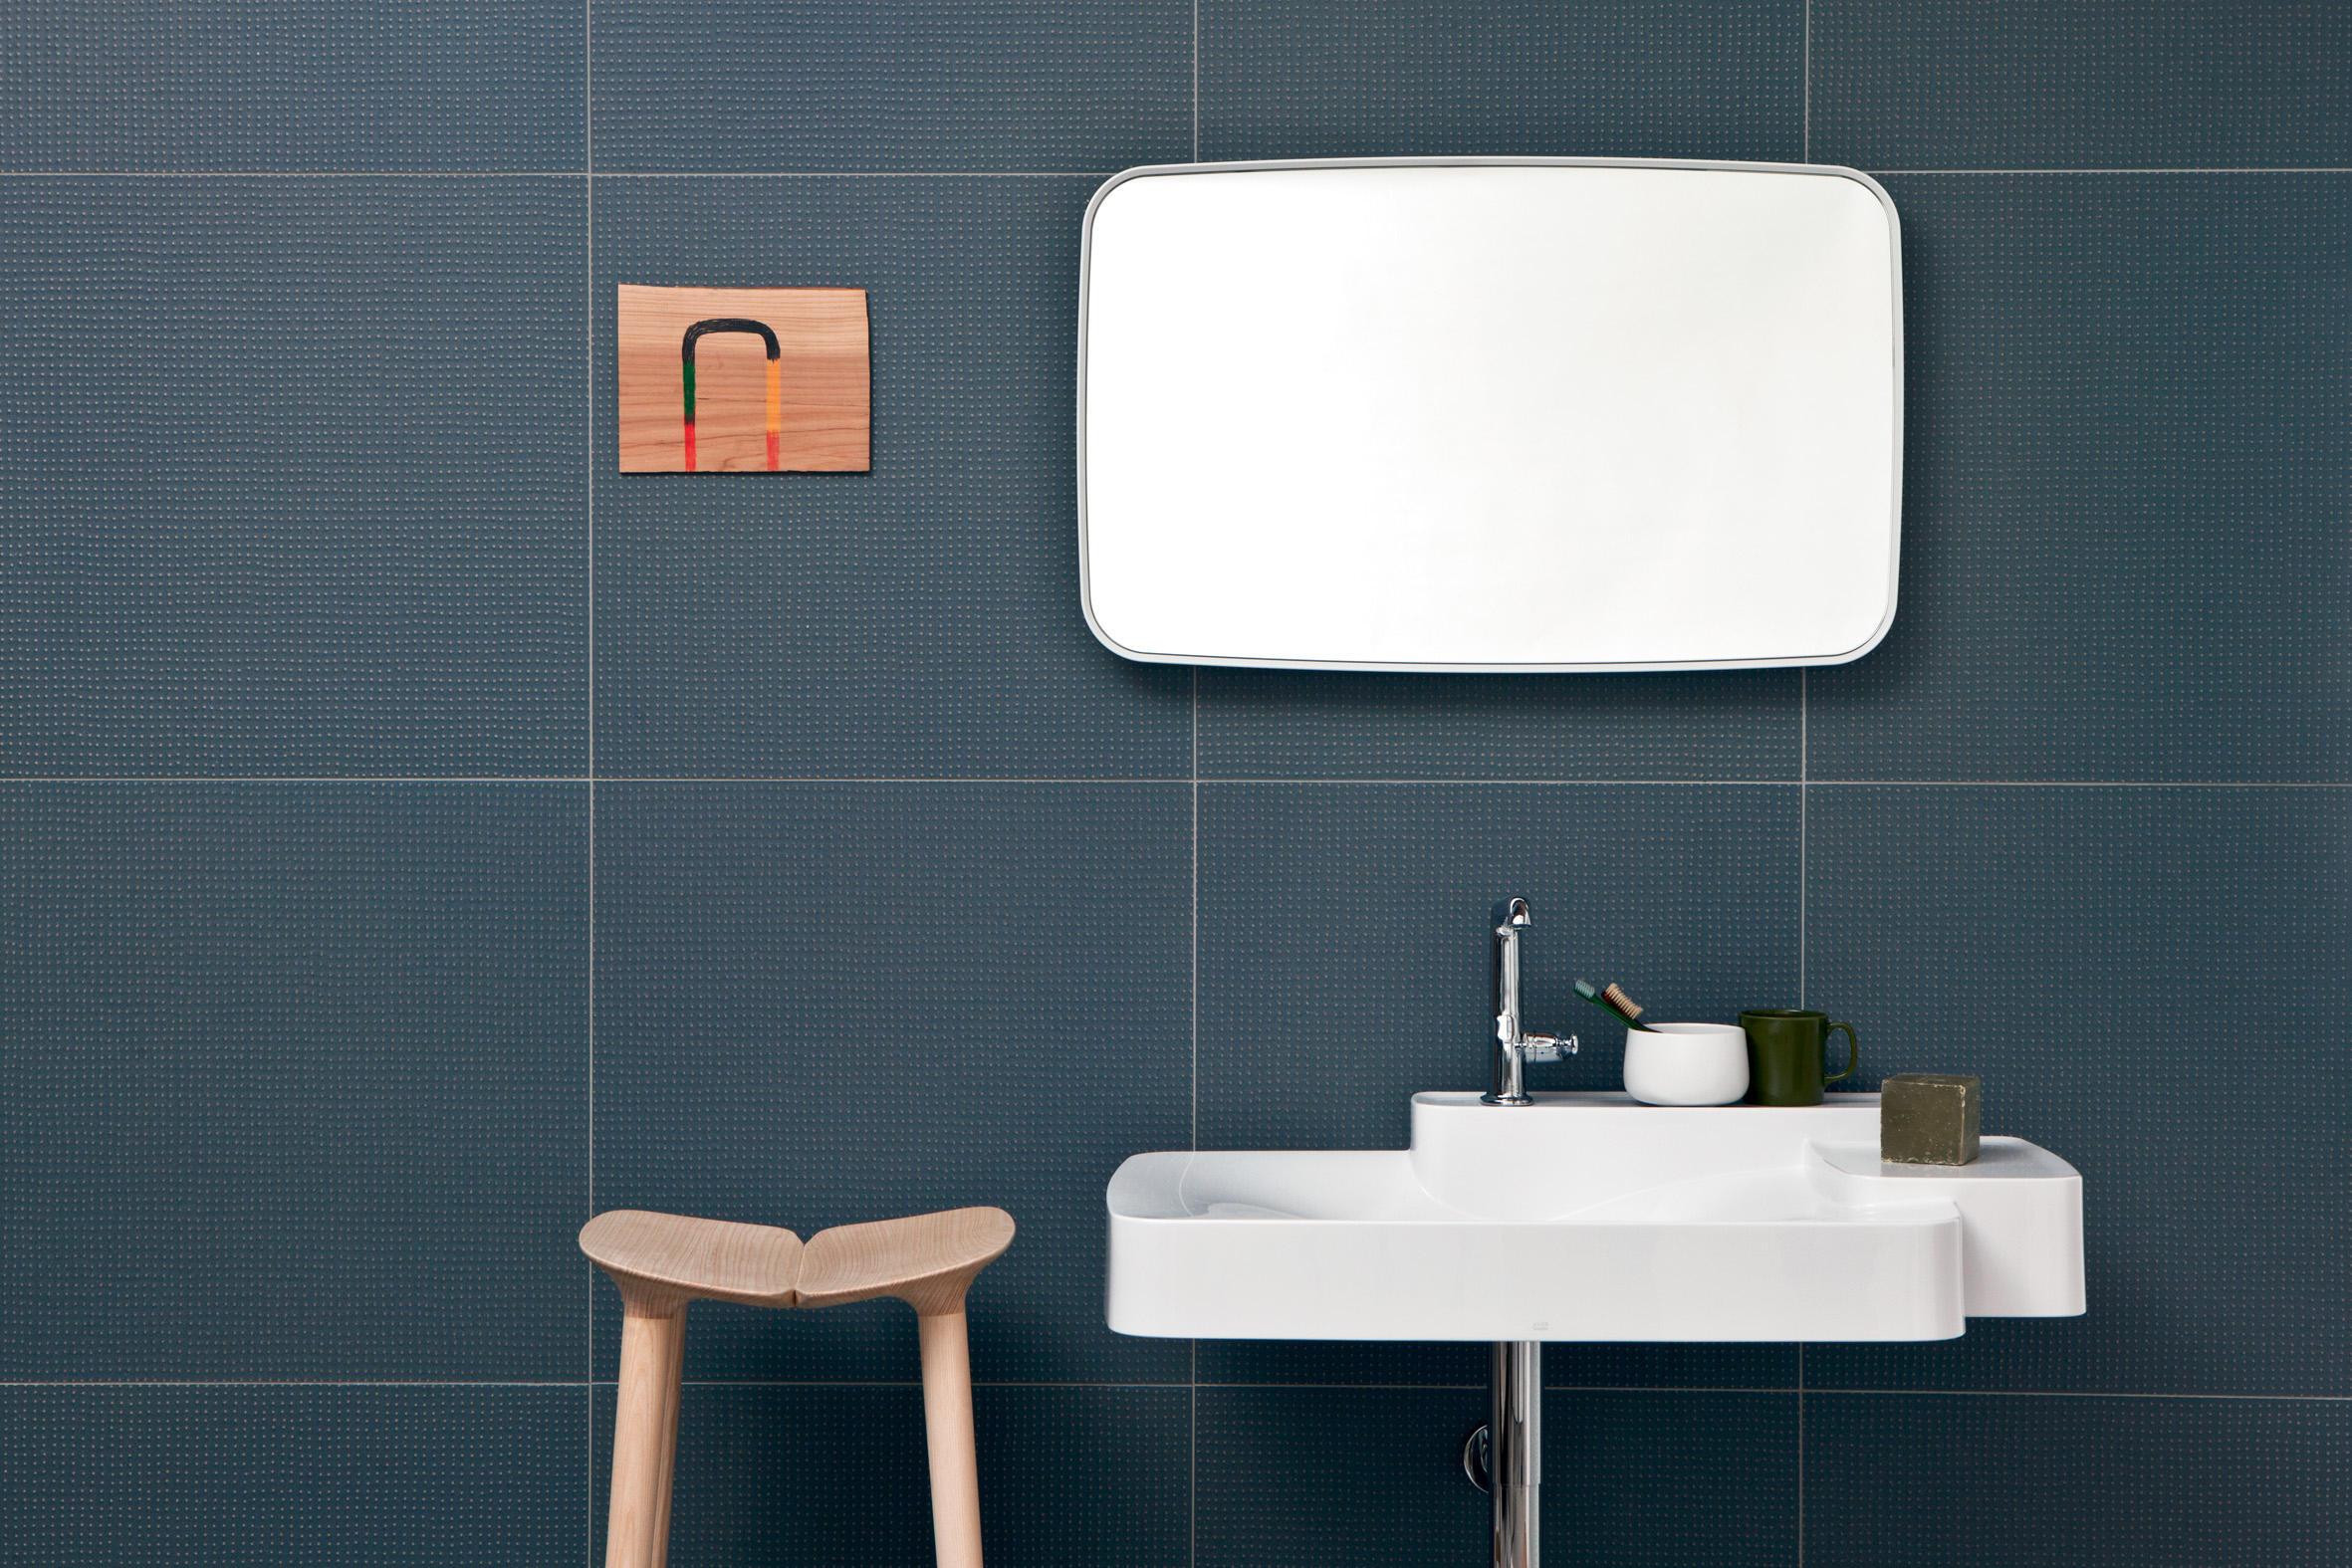 PICO UP ANTRACITE BLUE DOTS - Ceramic panels from Ceramiche Mutina  Architonic